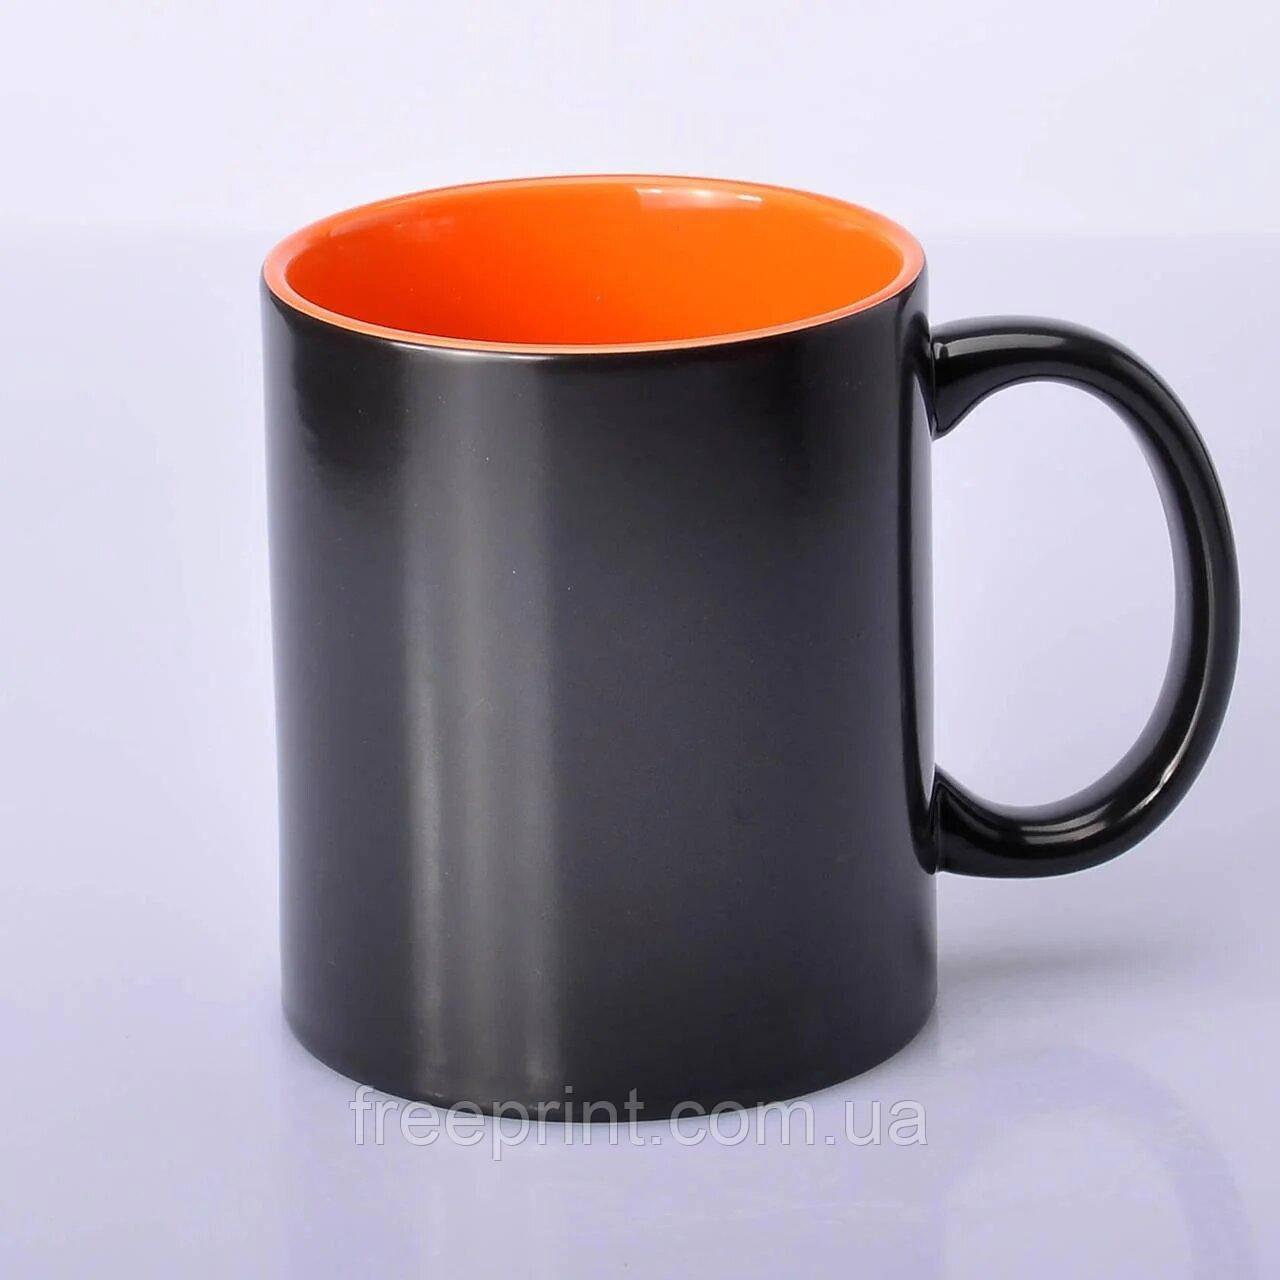 Друк на чашках-хамелеонах